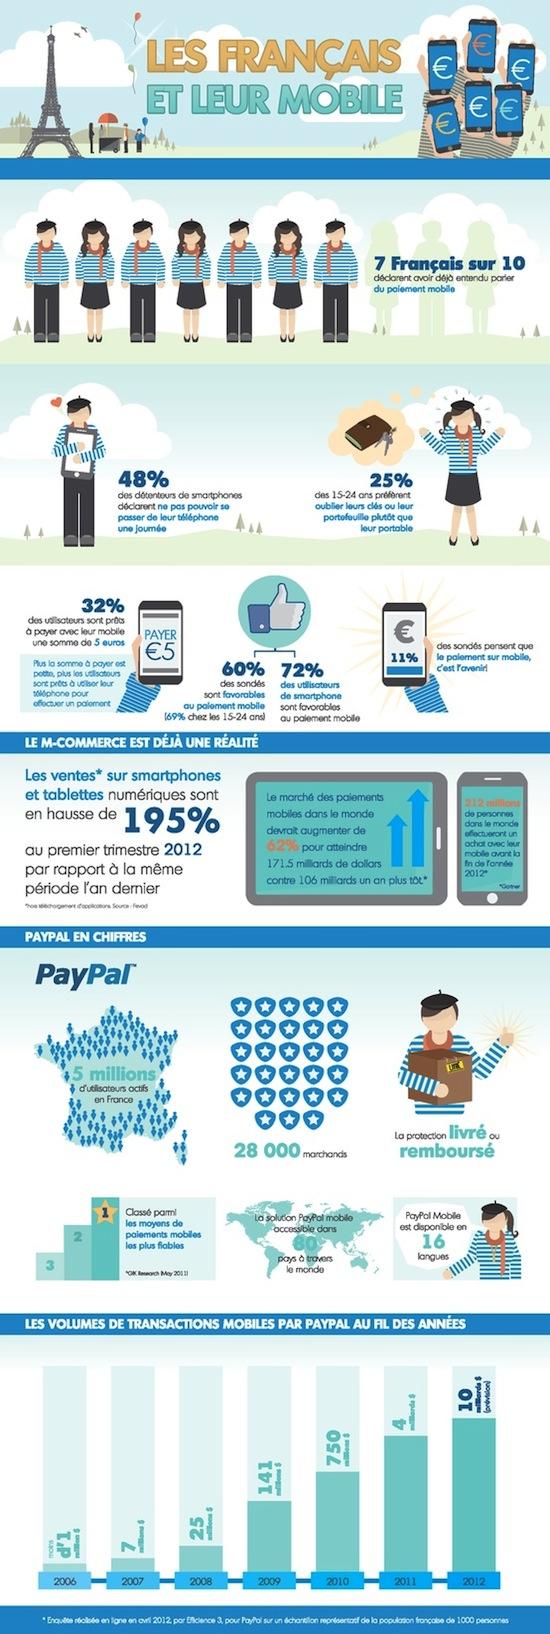 M-commerce-paypal-paiement-mobile-infographie